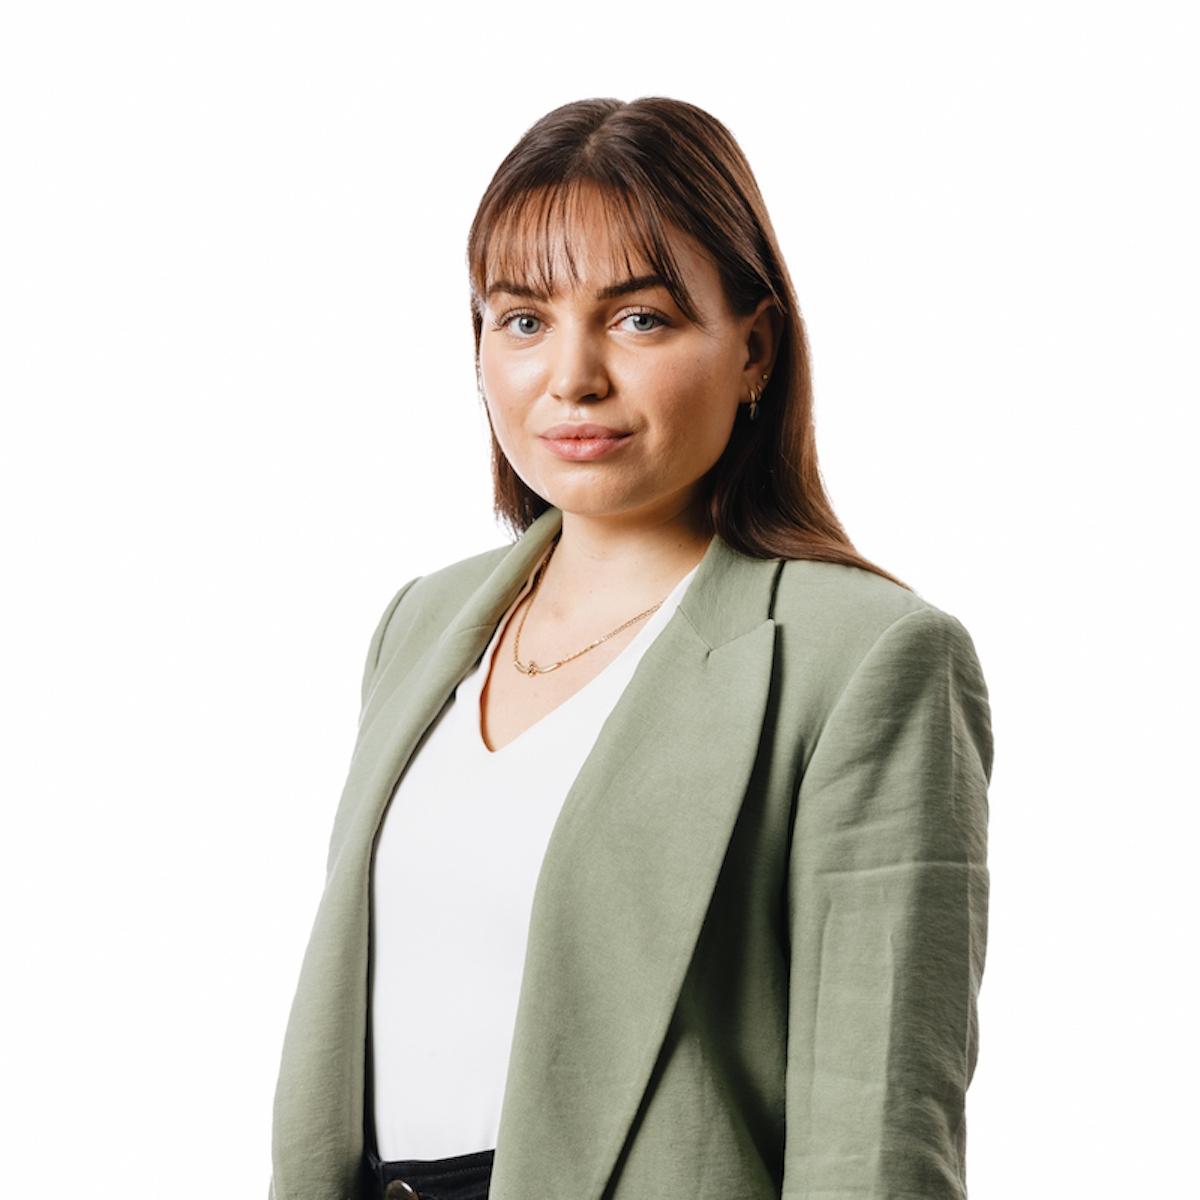 Maija Roukala